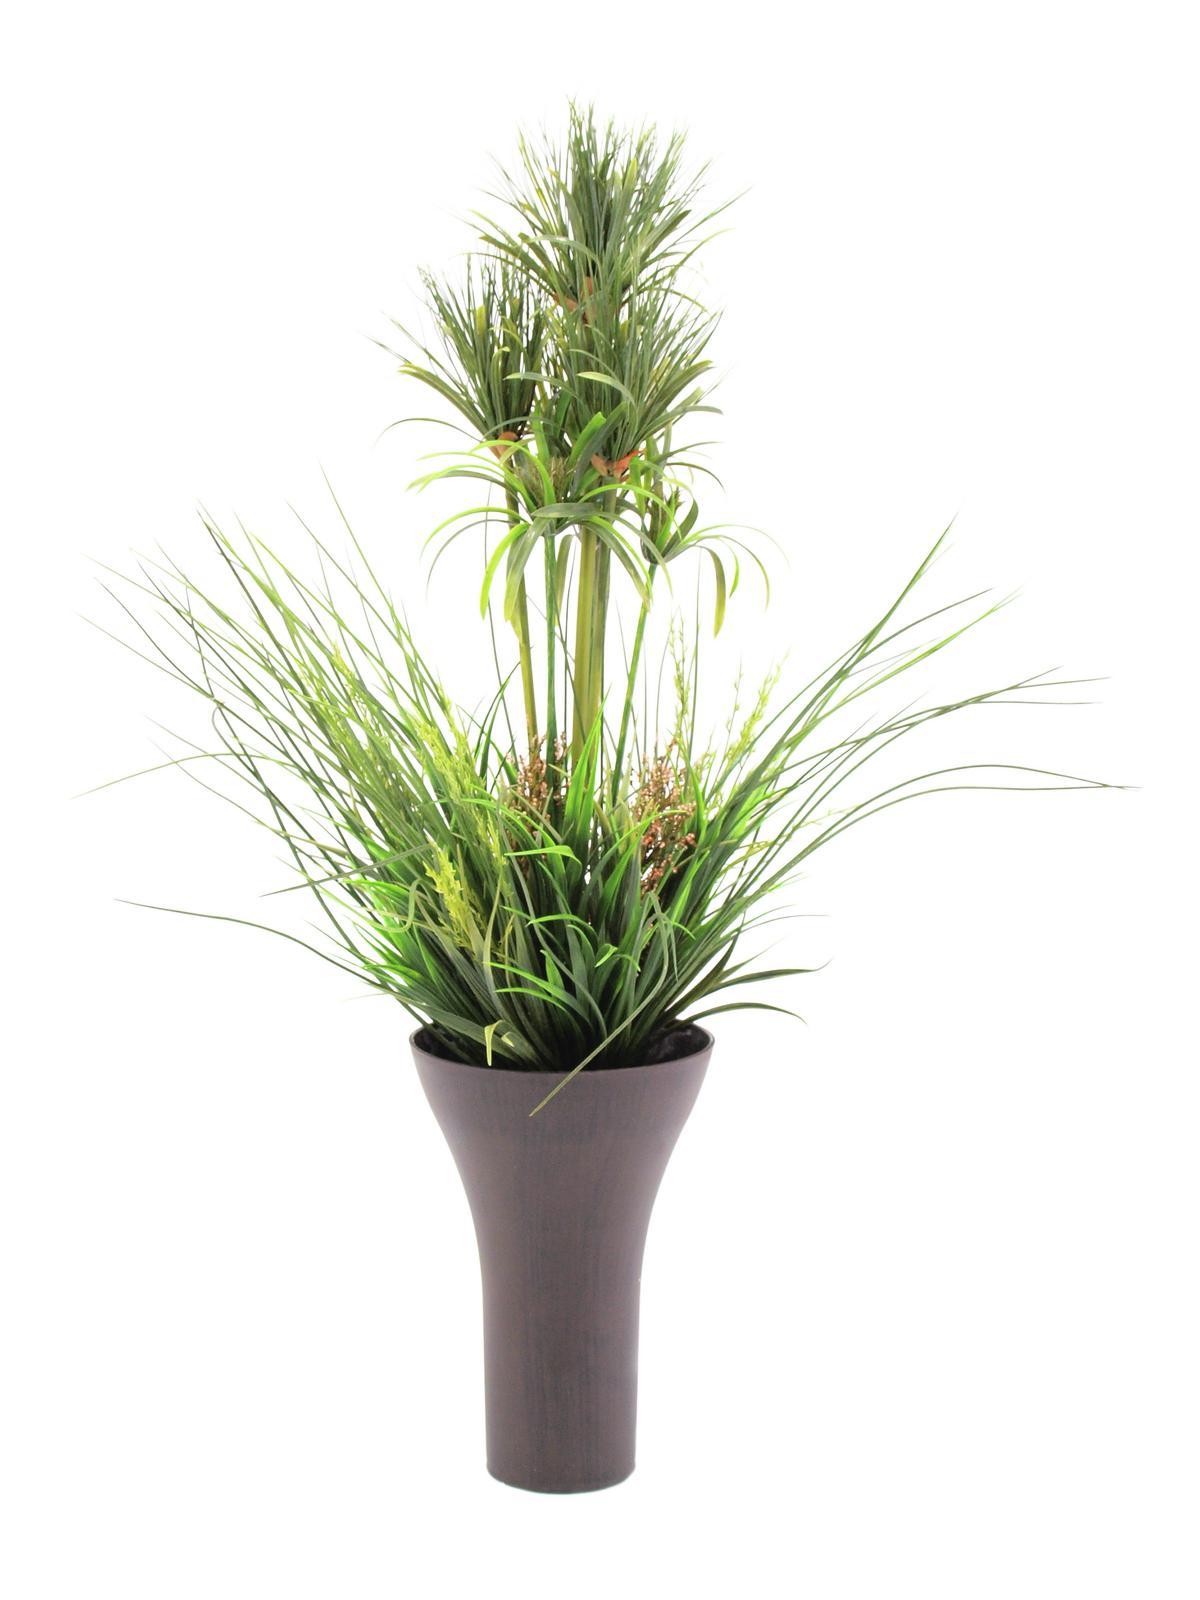 europalms-grasarrangement-90cm-kunststoffpflanze